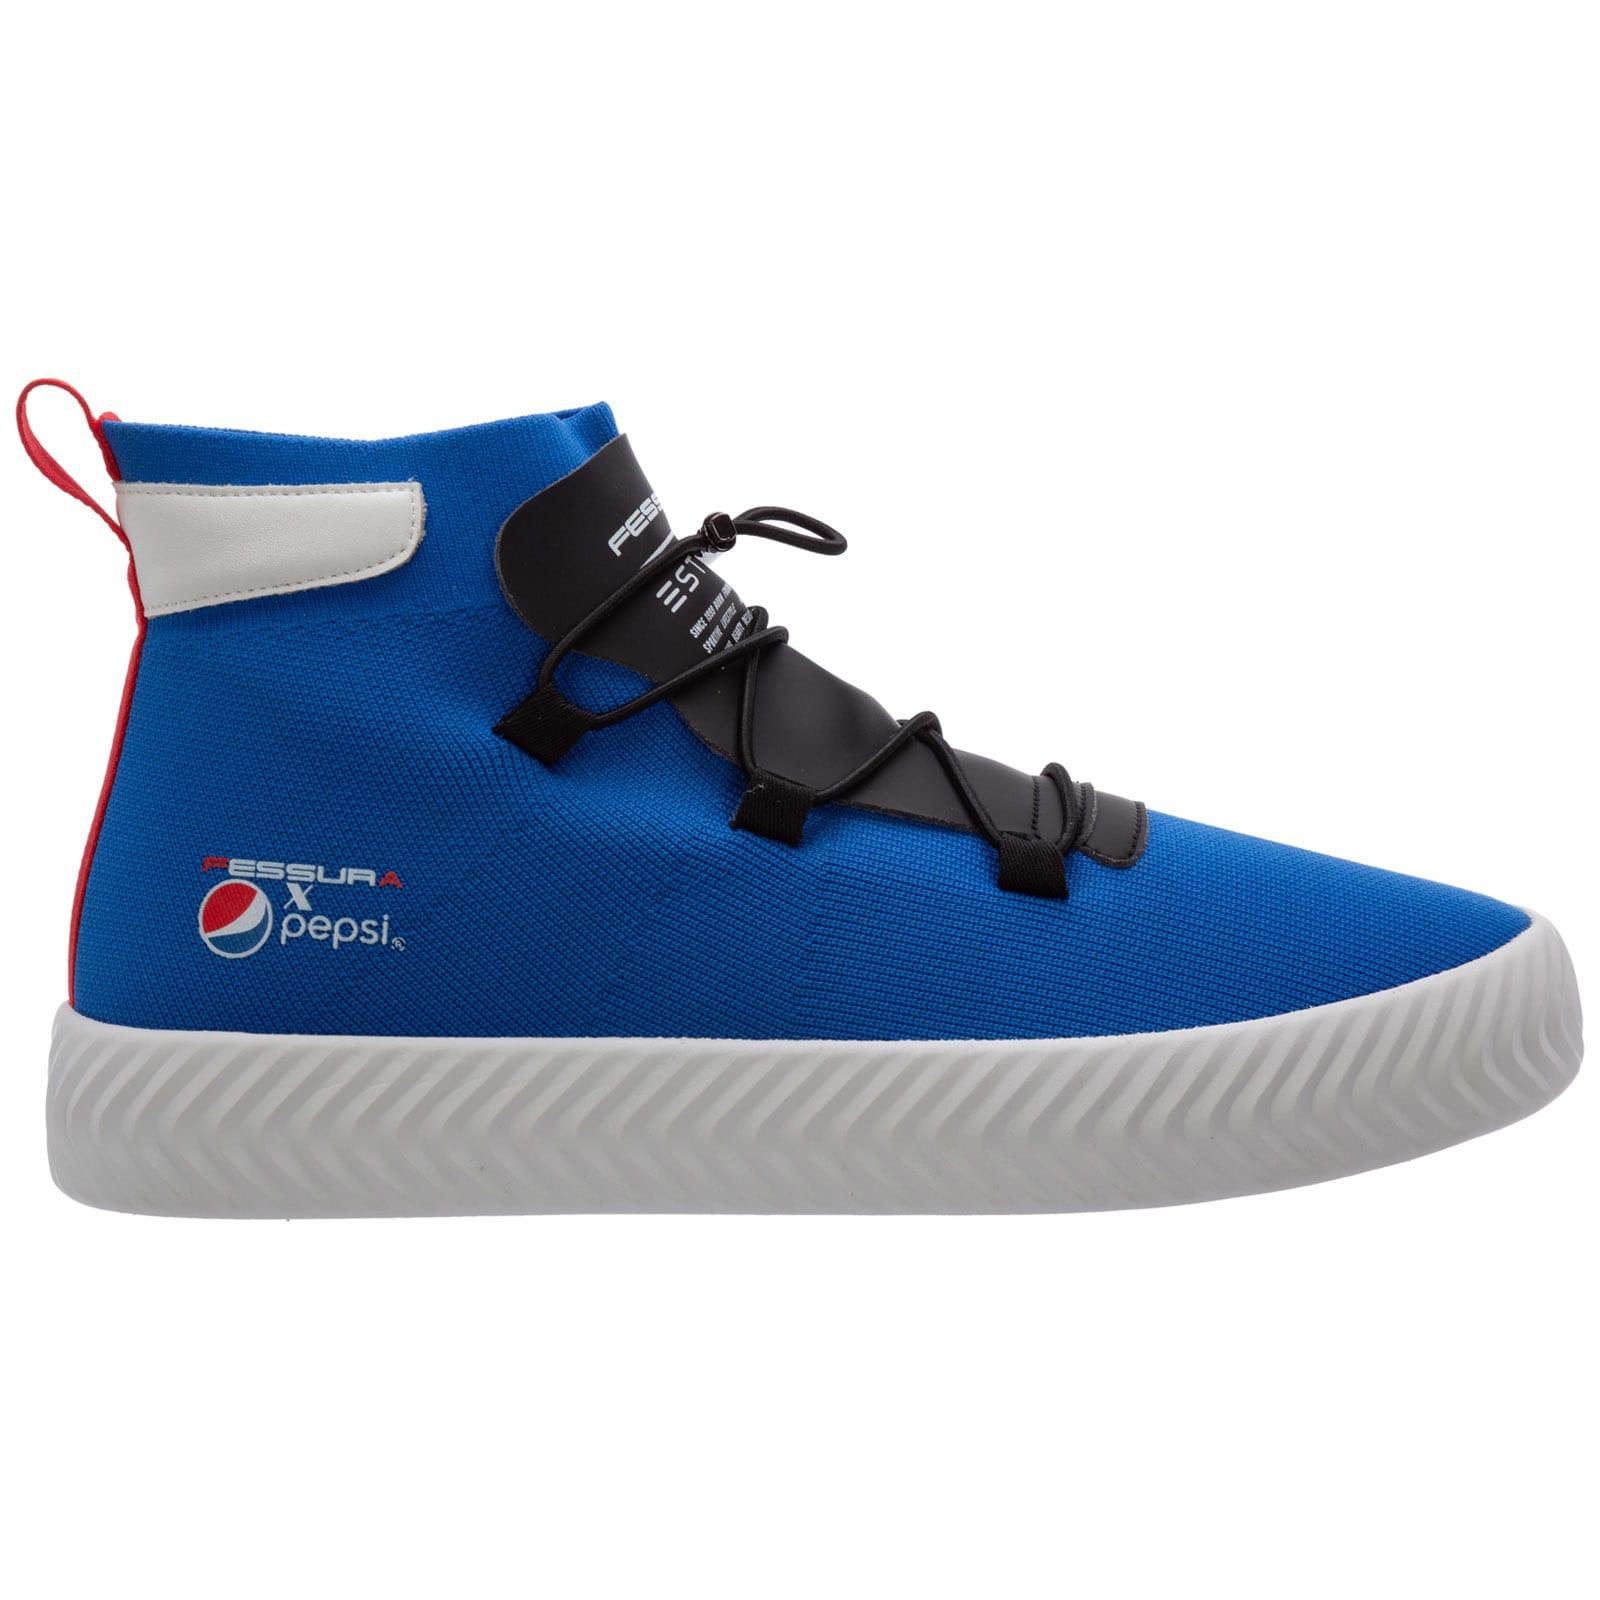 X Pepsi Arrow High-top Sneakers